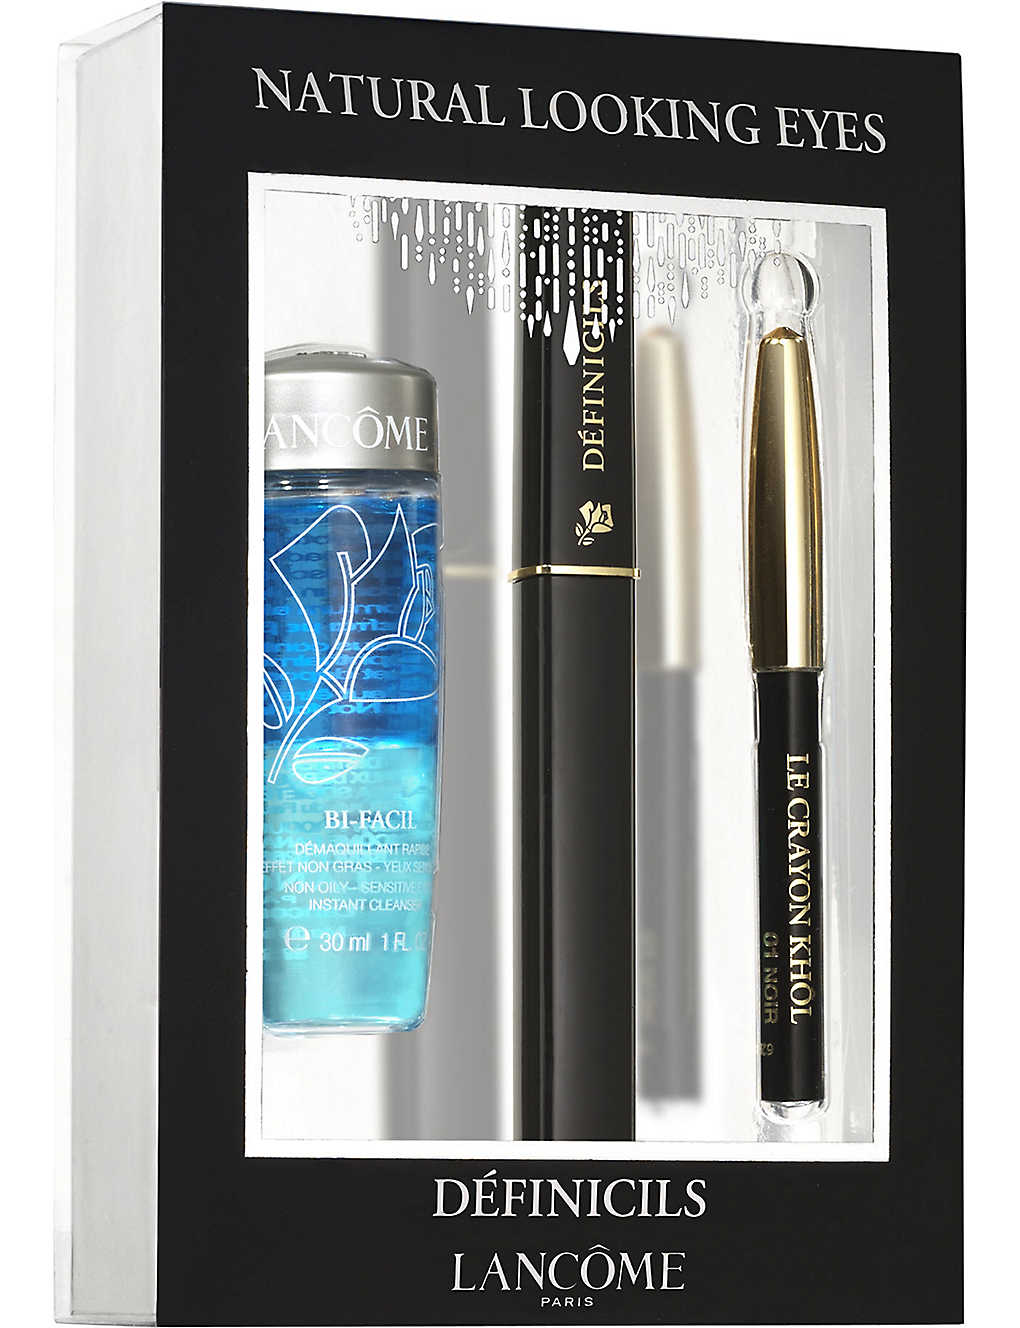 56a75faddc7 LANCOME - Definicils Mascara gift set   Selfridges.com